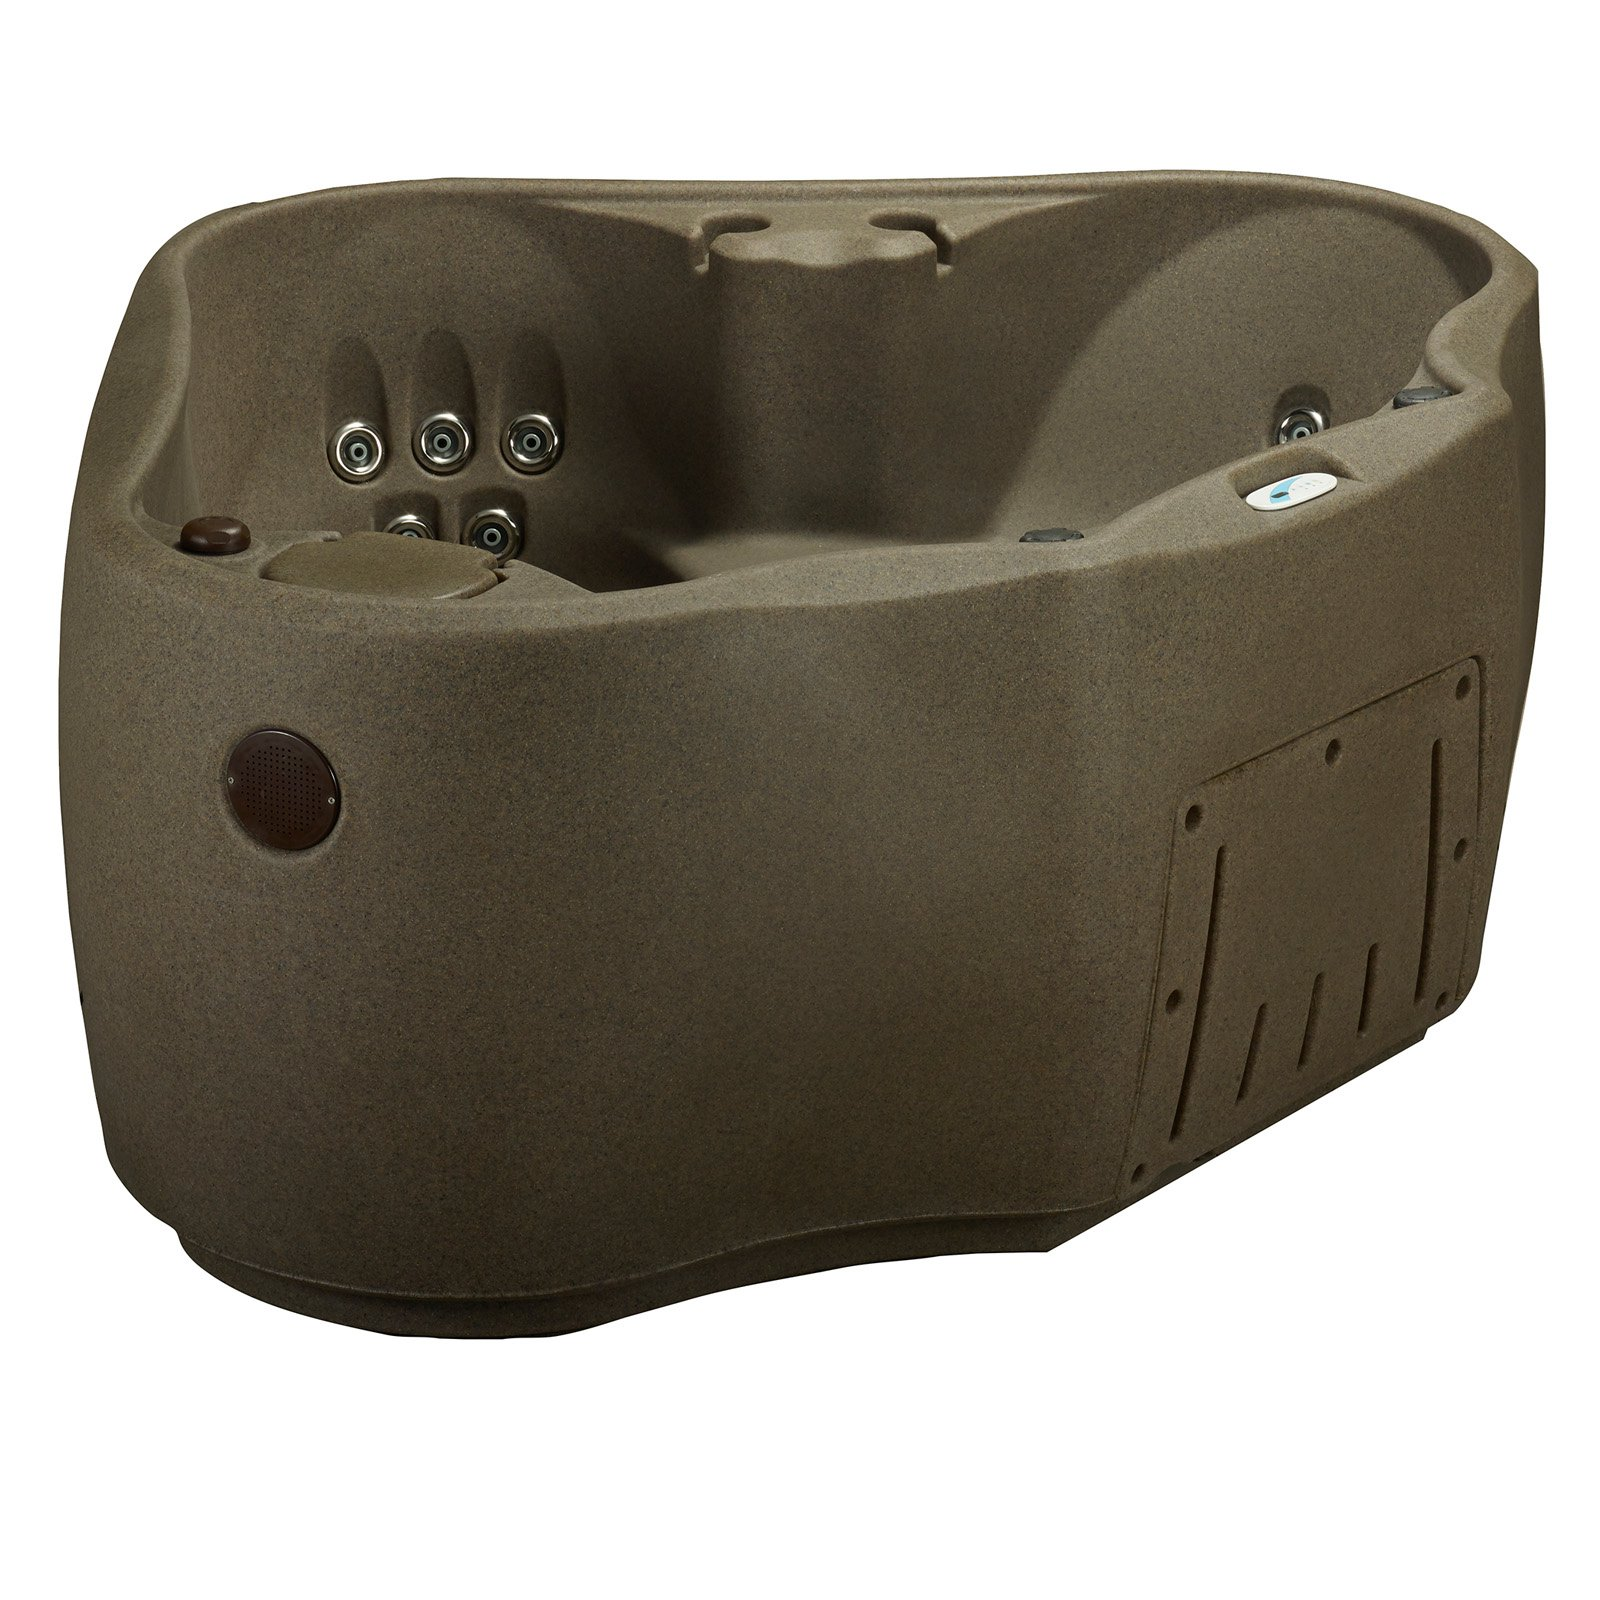 AquaRest AR-300 2 Person Jet Spa Hot Tub by Kahla